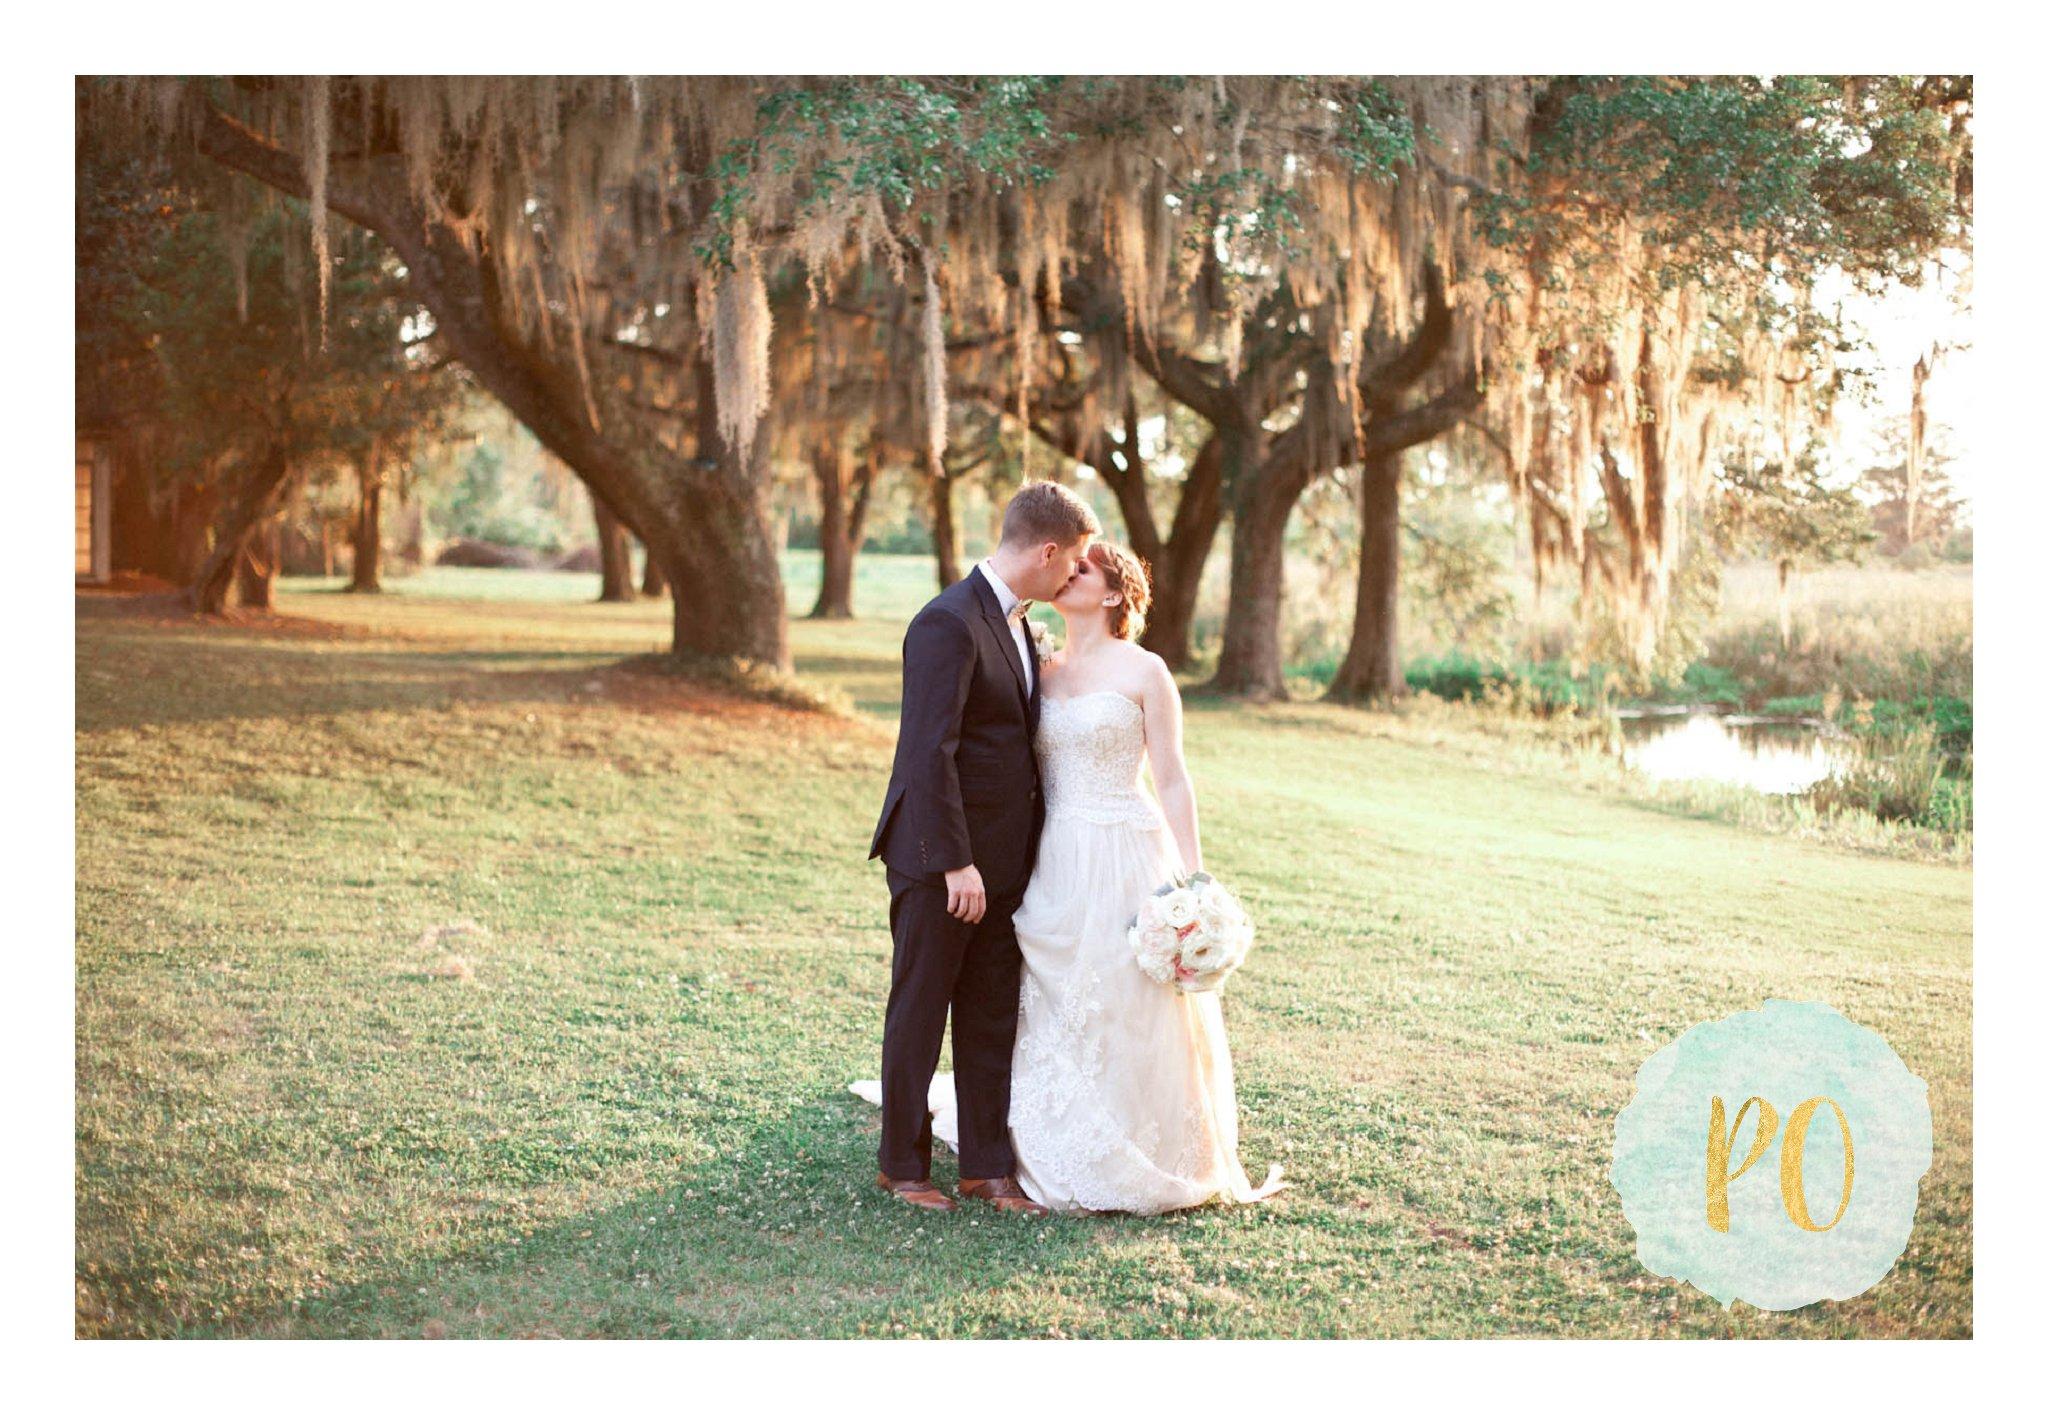 the-litchfield-plantation-pawleys-island-sc-wedding-photos_0064.jpg